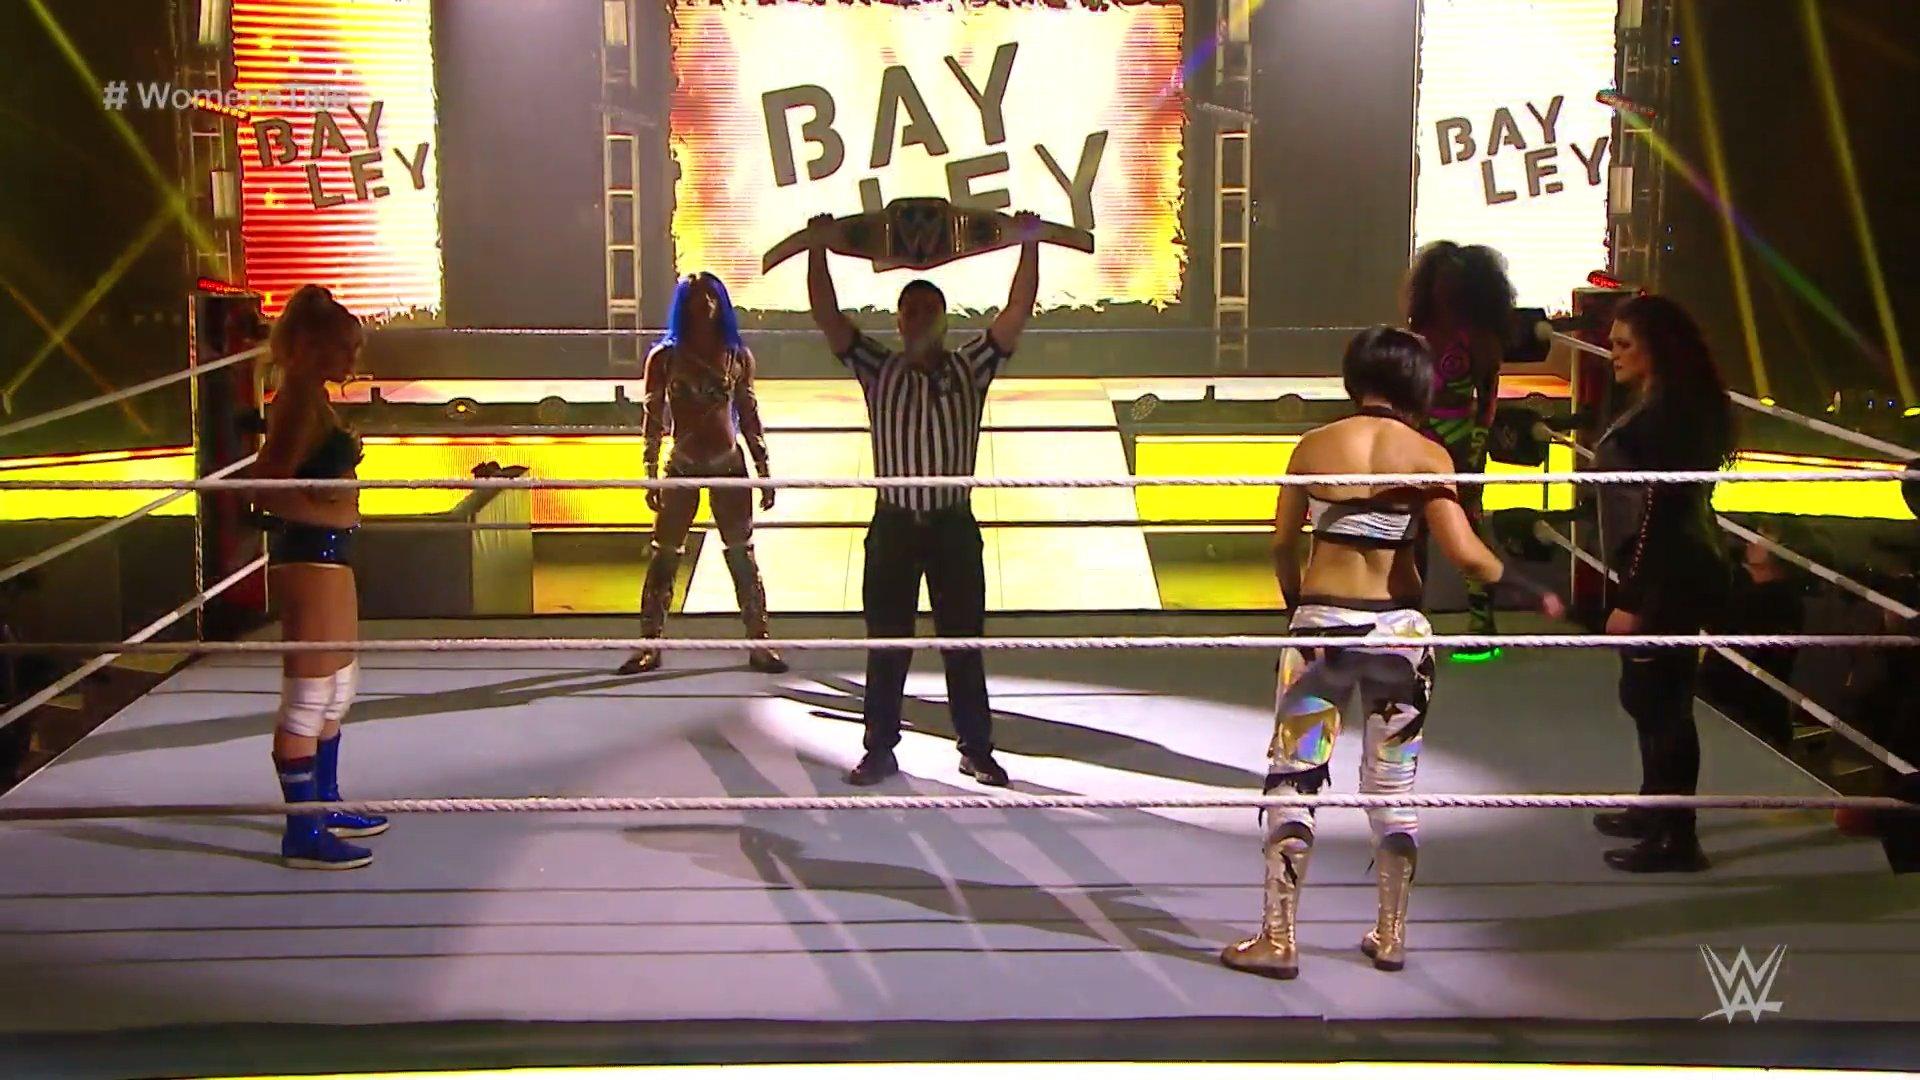 WWE Wrestlemania 36 Night II Results: April 5, 2020 3